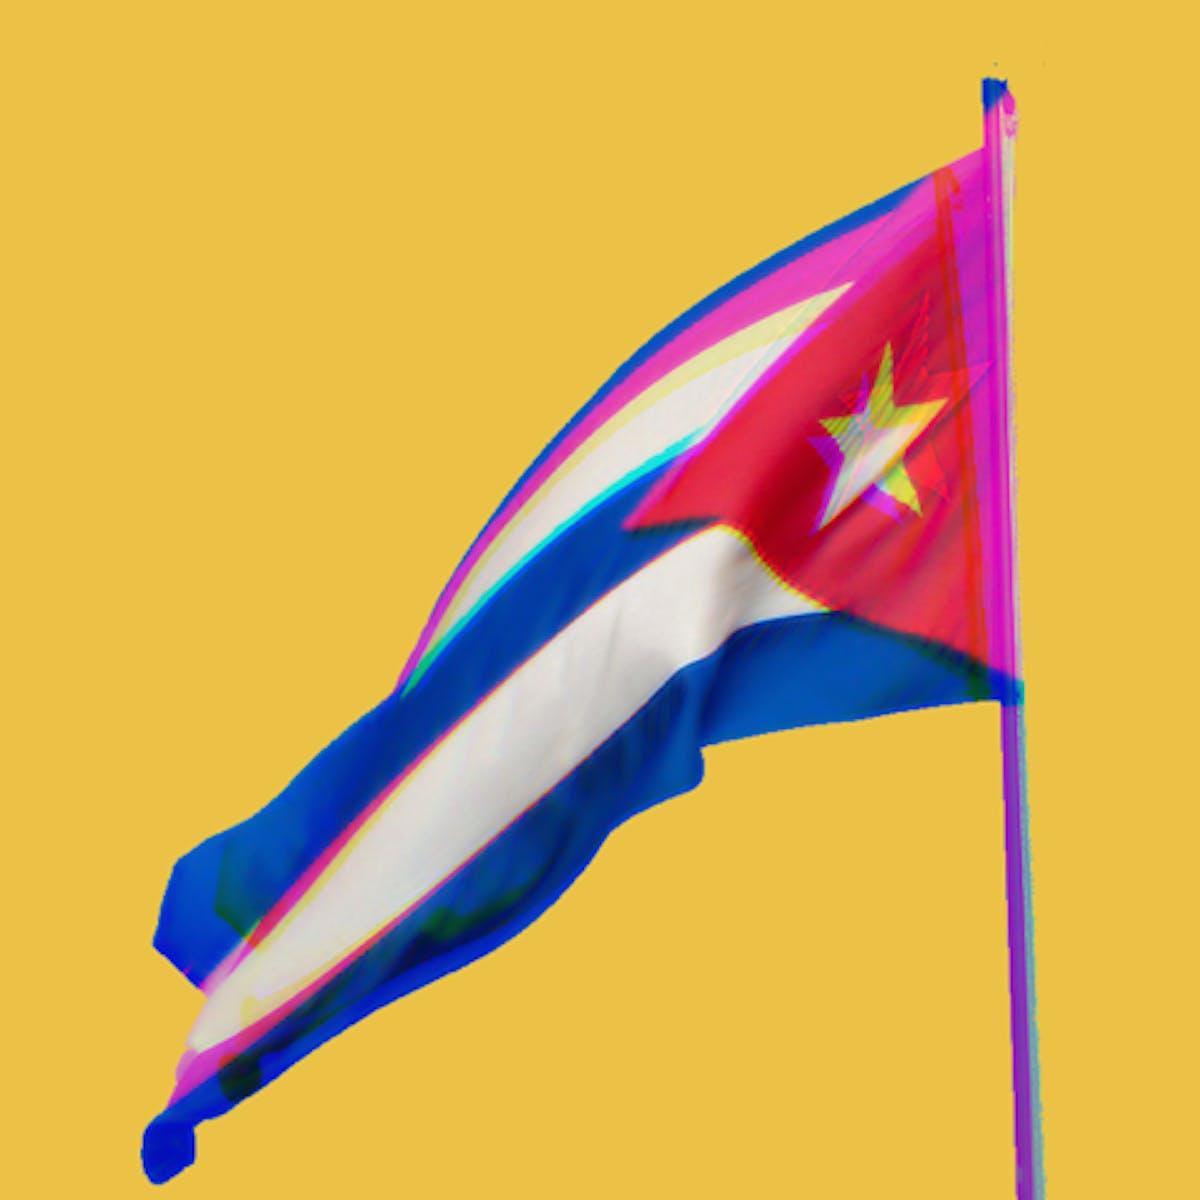 Havana Syndrome: Brain Imaging of US Diplomats Eliminates Leading Theory